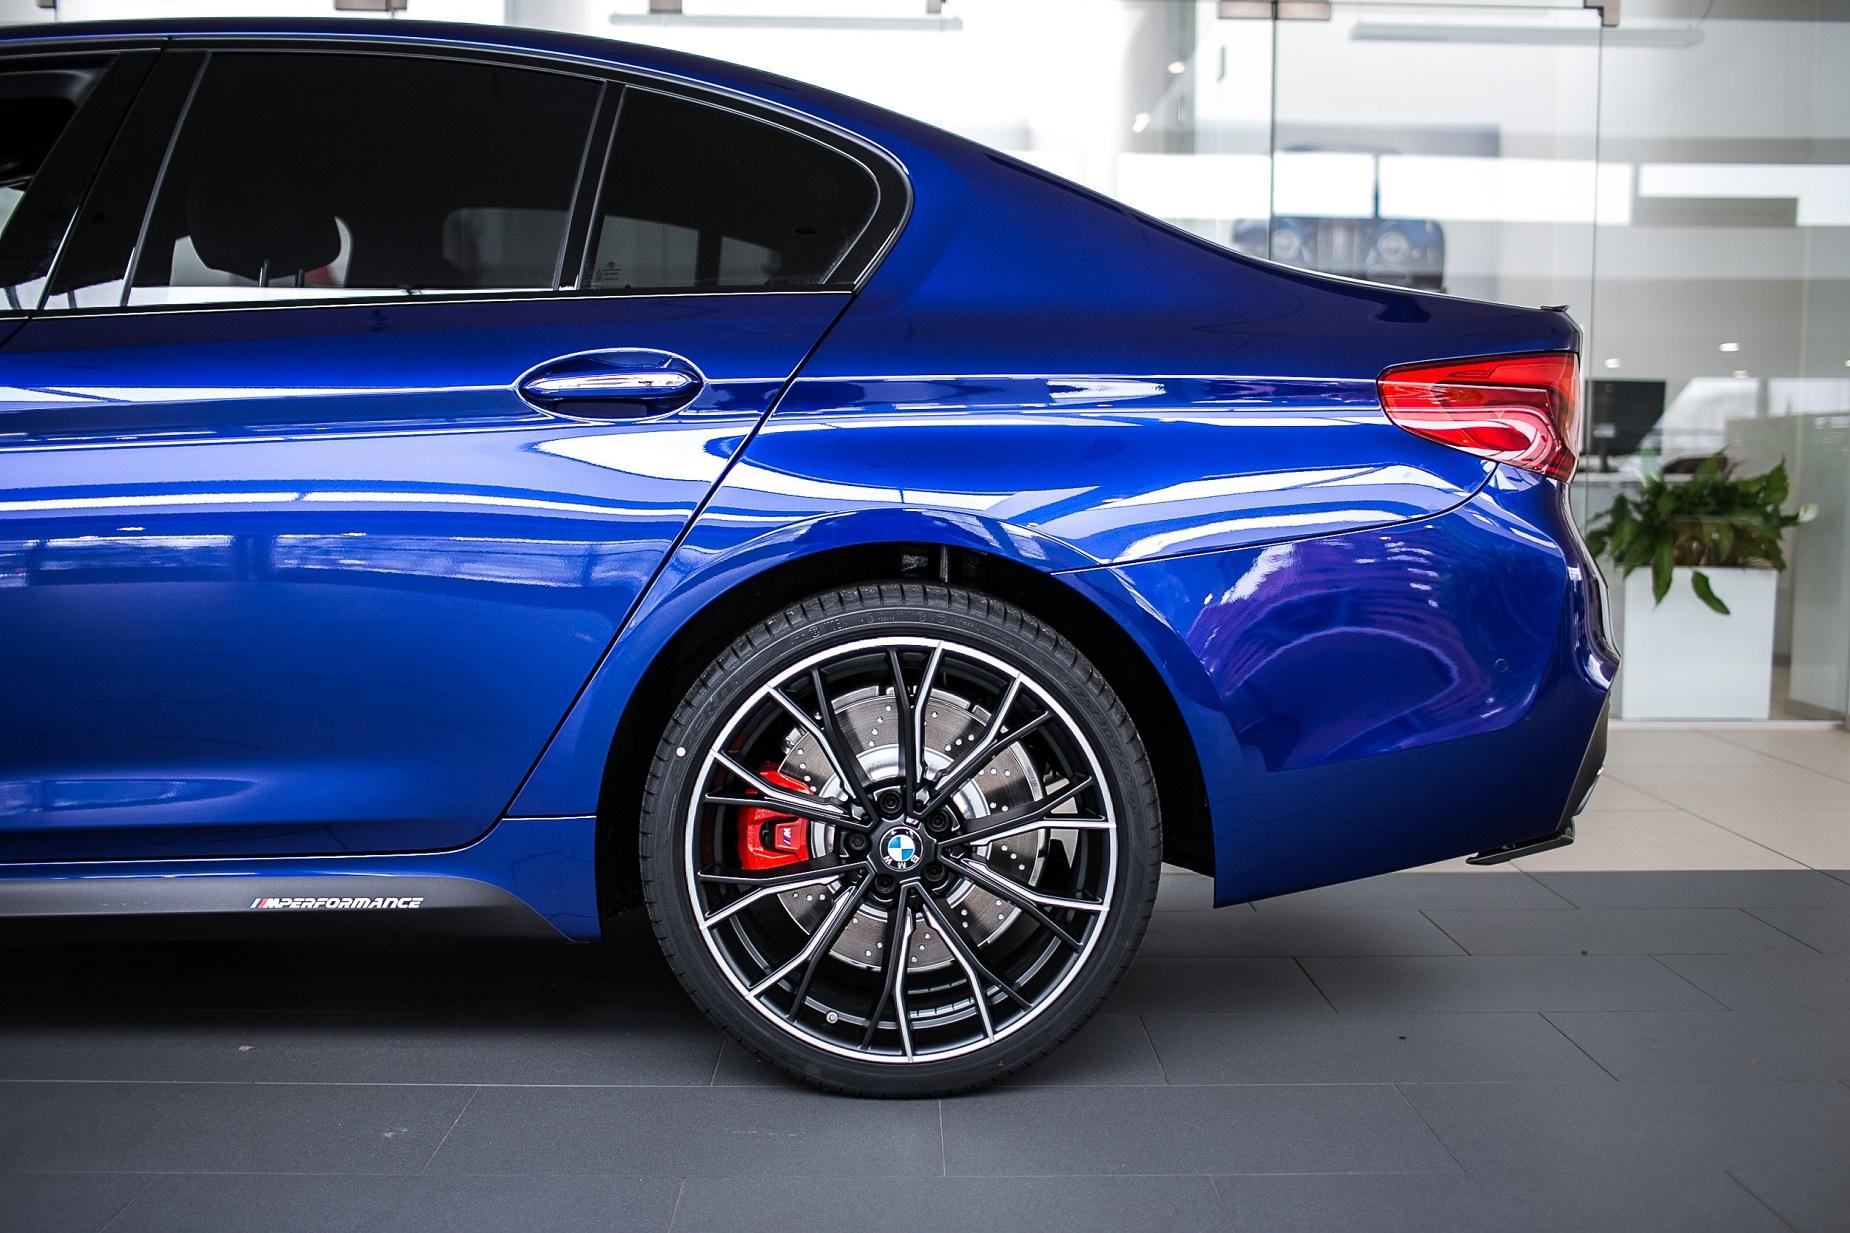 Bmw Individual San Marino Blue 540i Xdrive With Full M